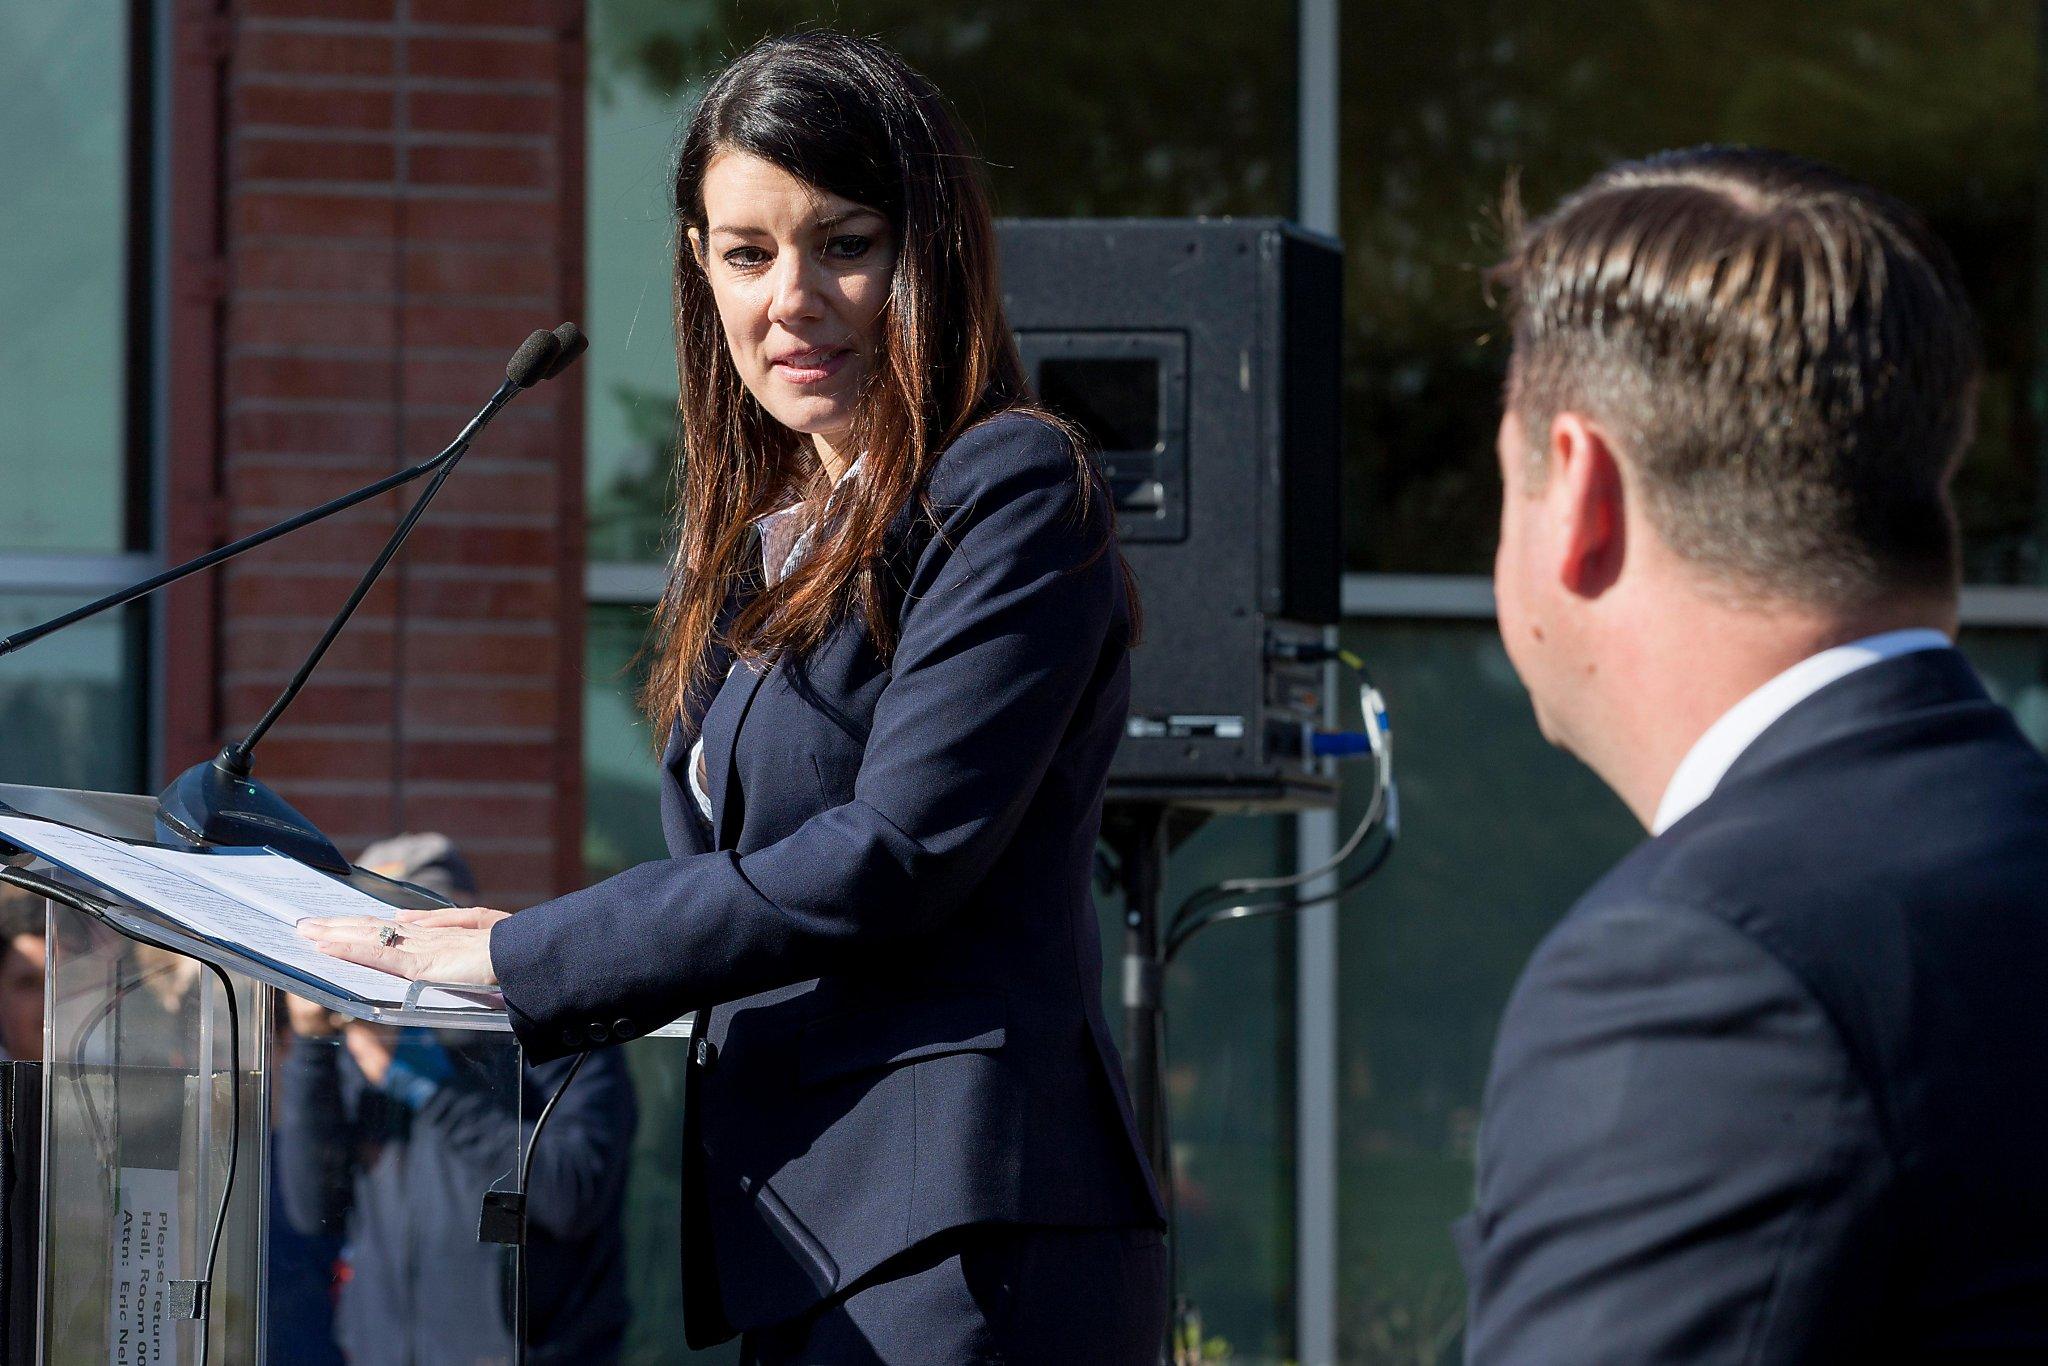 SF Supervisor Stefani Wants Indigenous People Italian